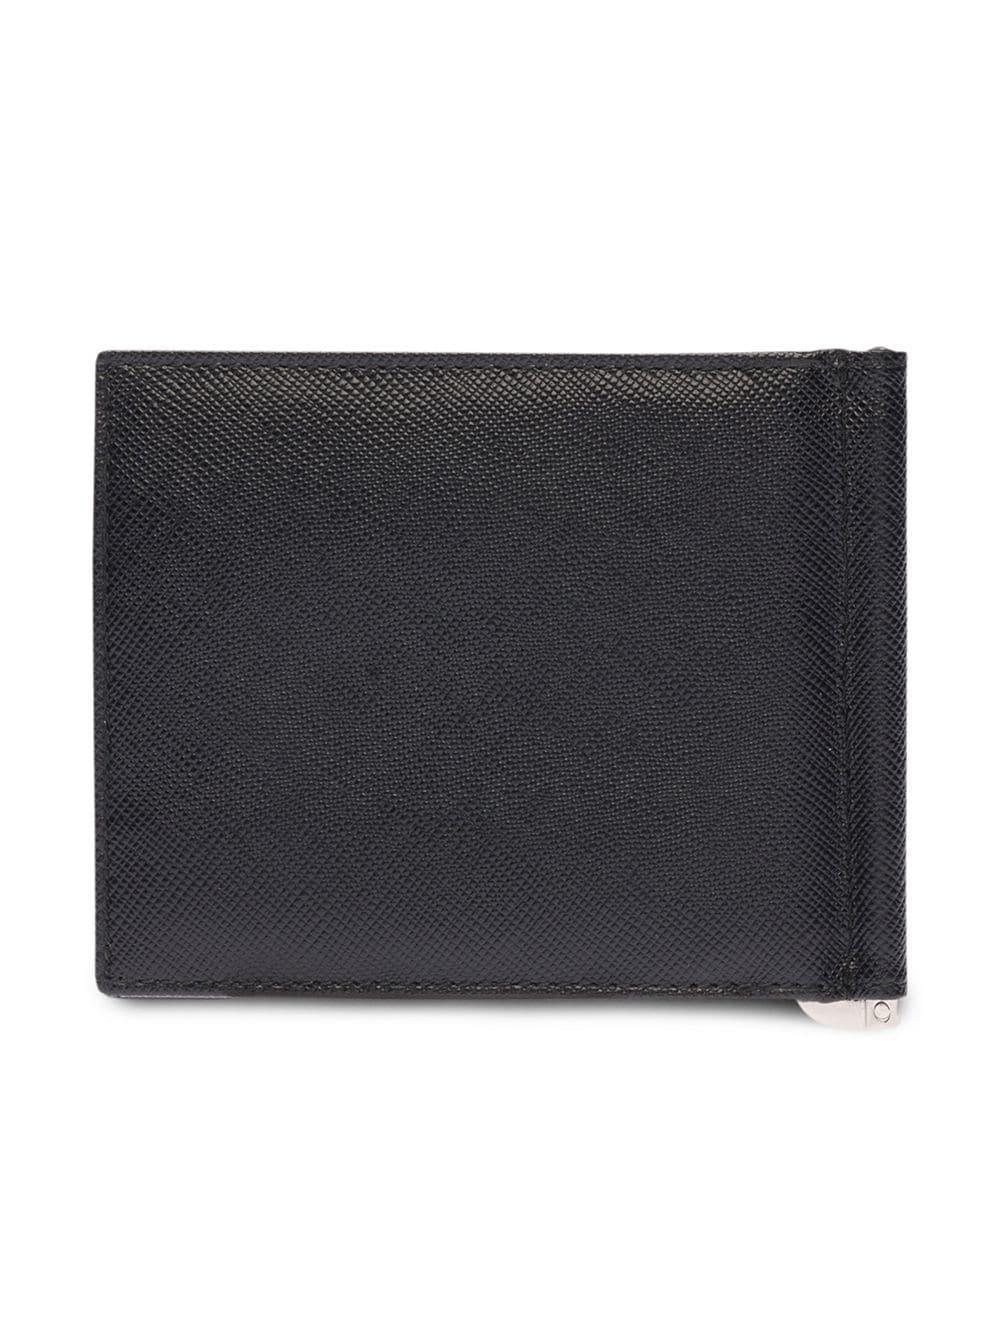 5884ee1214a4 ... 50% off prada black bifold wallet for men lyst. view fullscreen 46657  e6e70